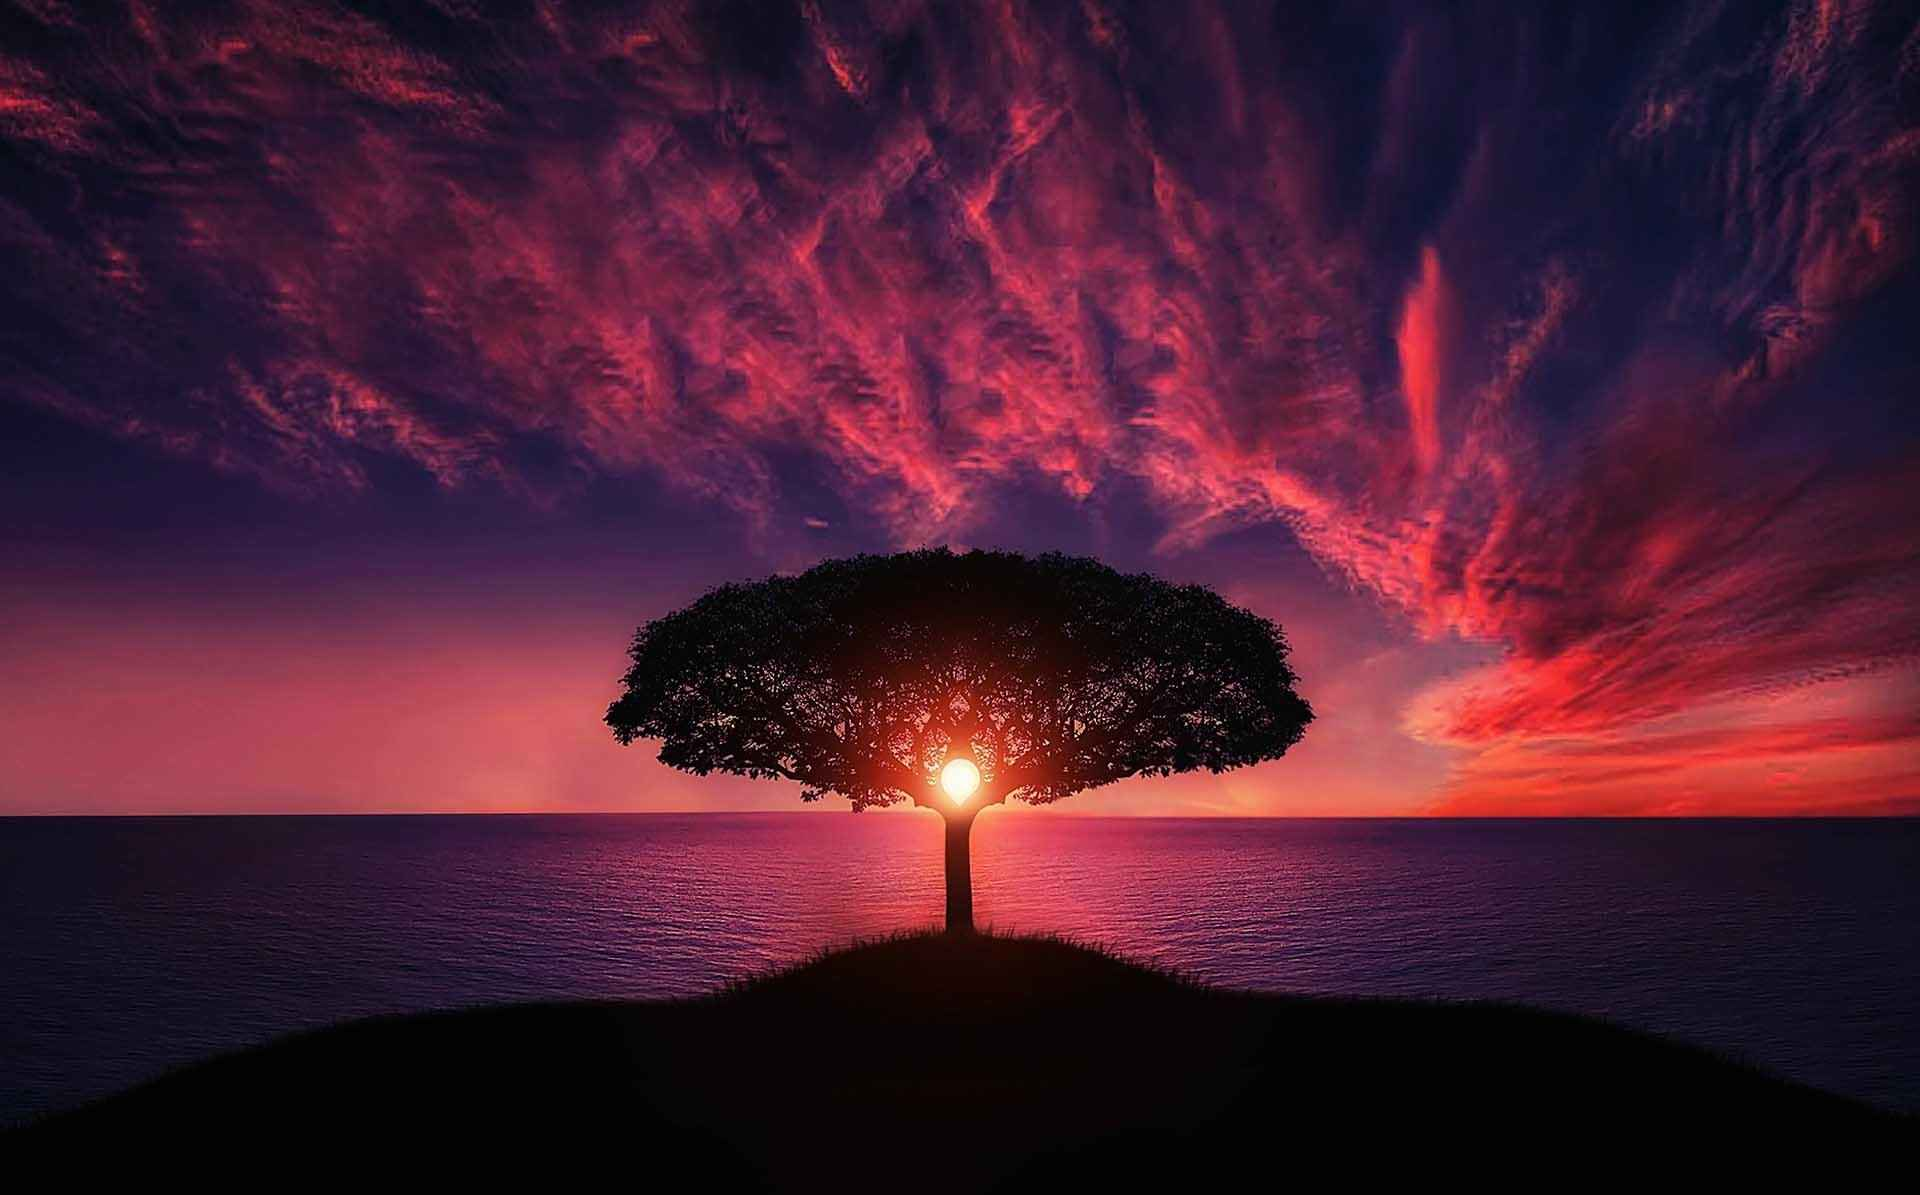 tree-of-life-rose-sunset-ocean